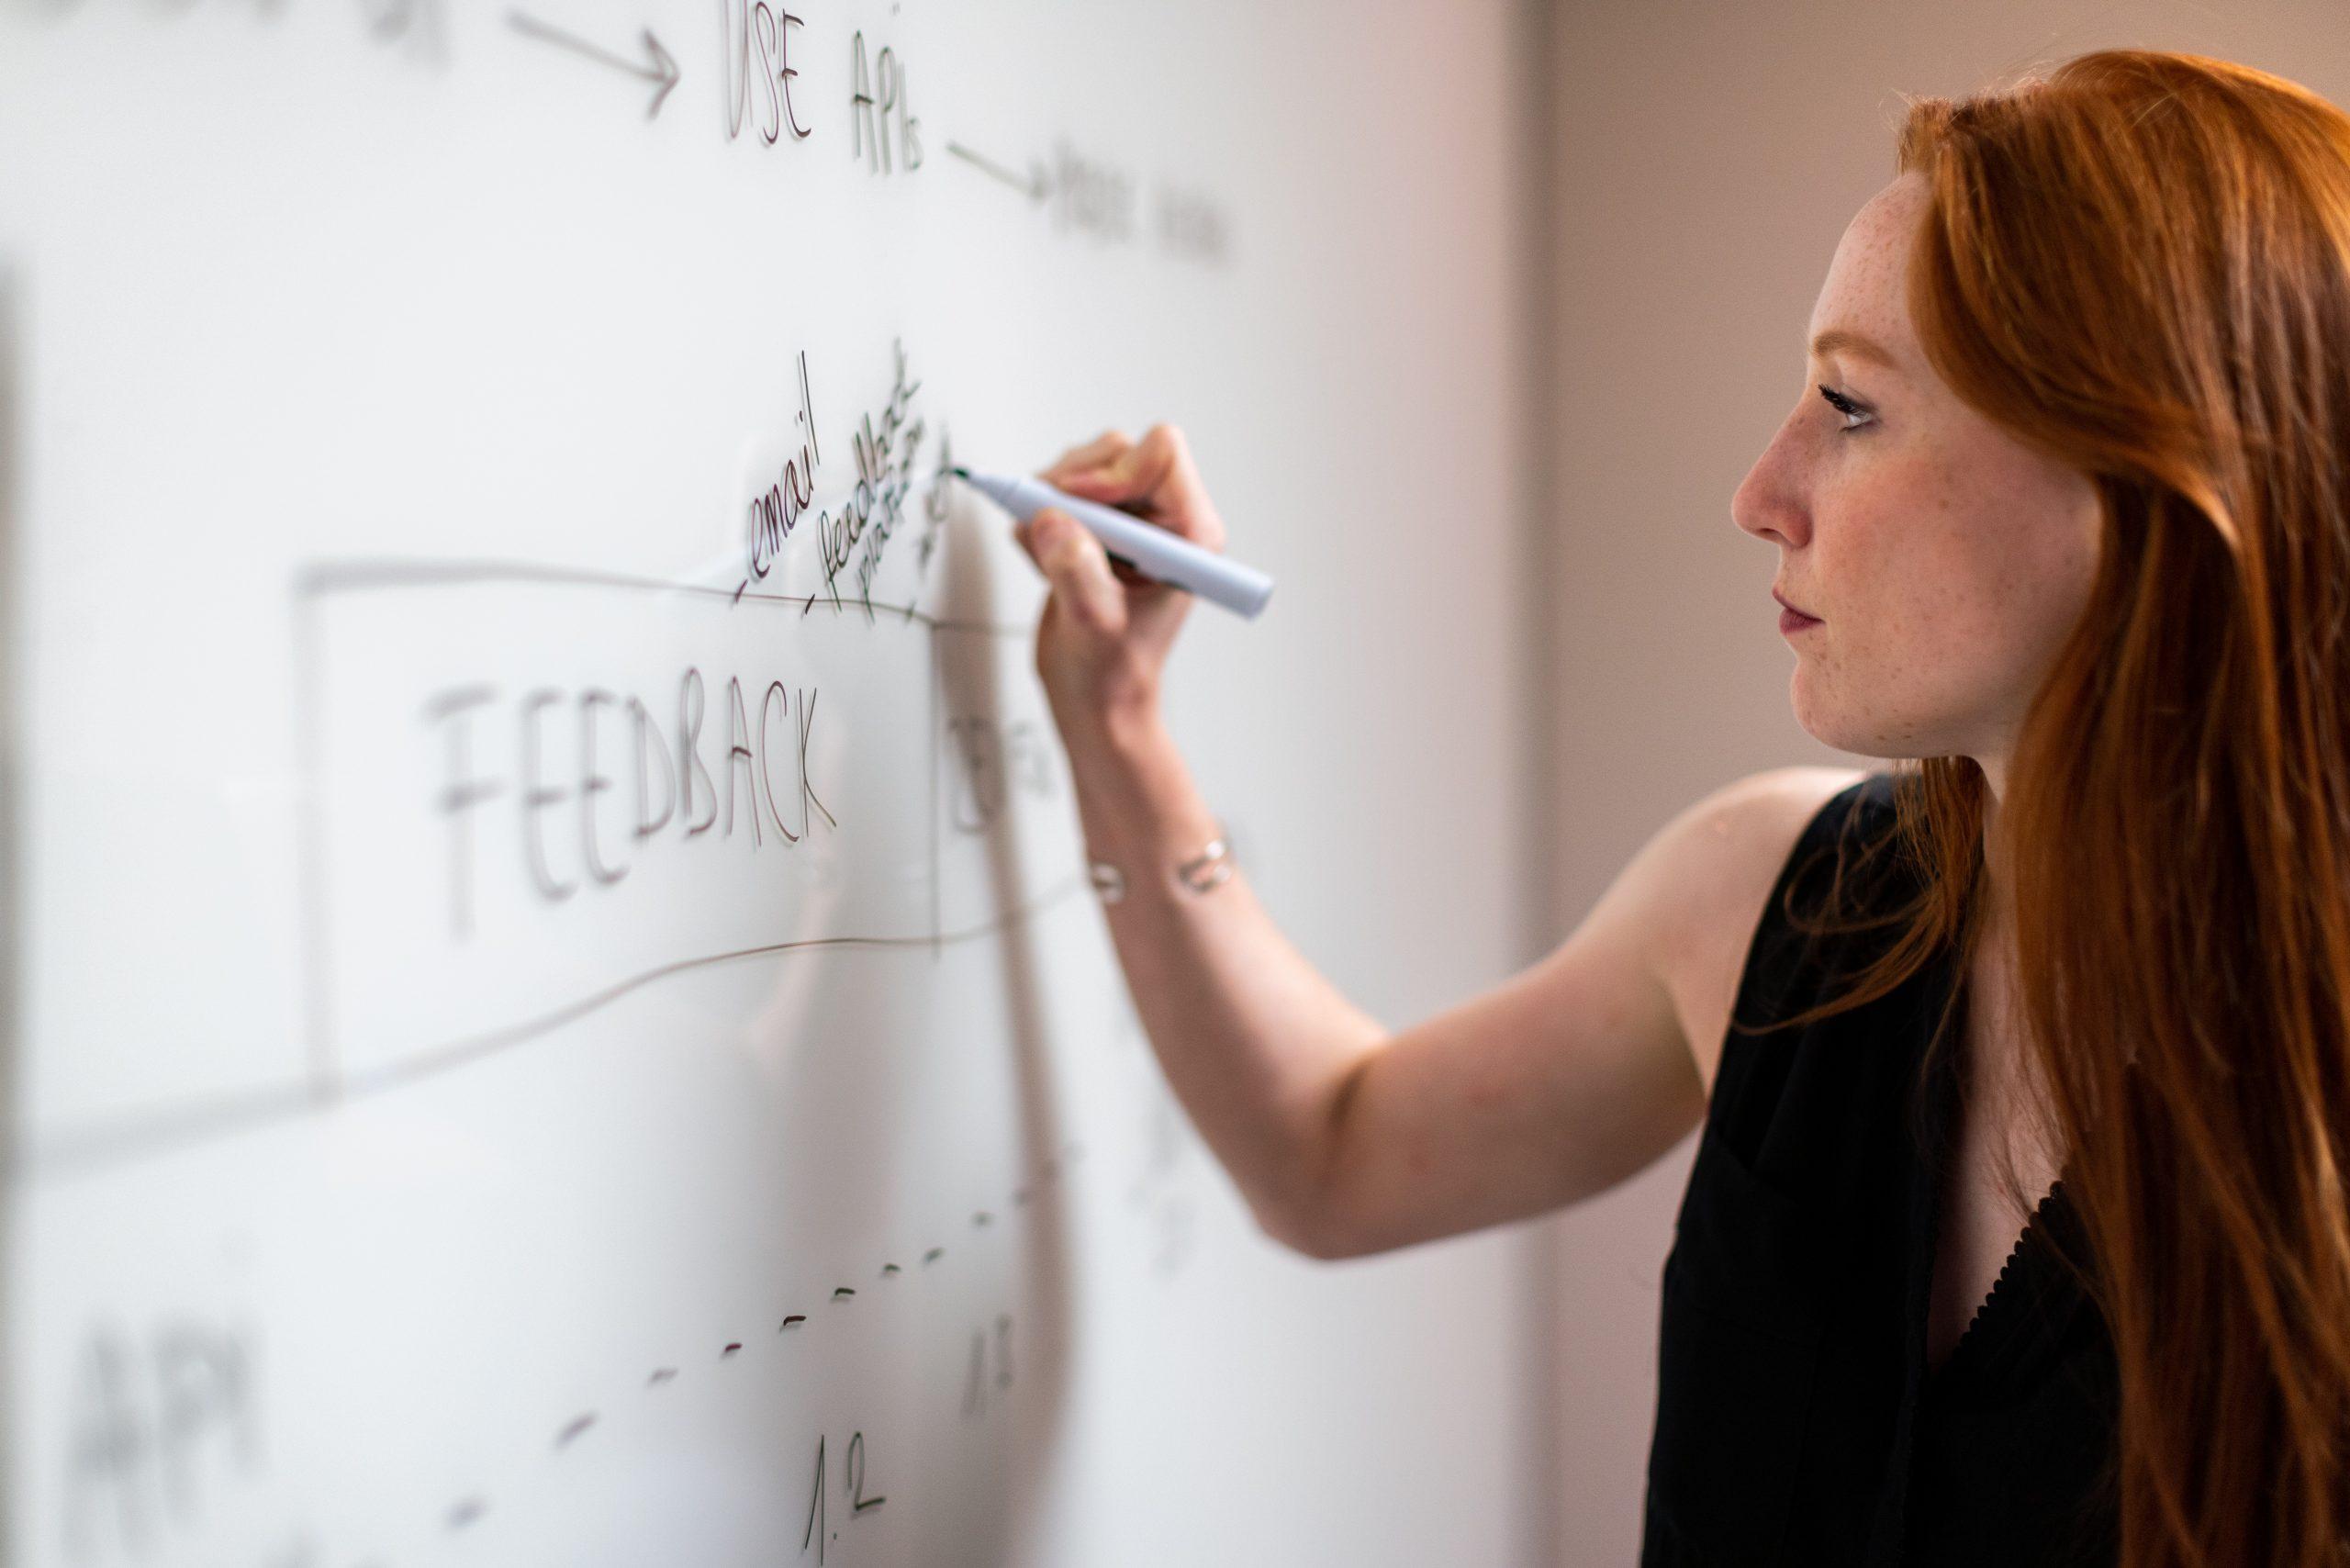 Girl writing on whiteboard